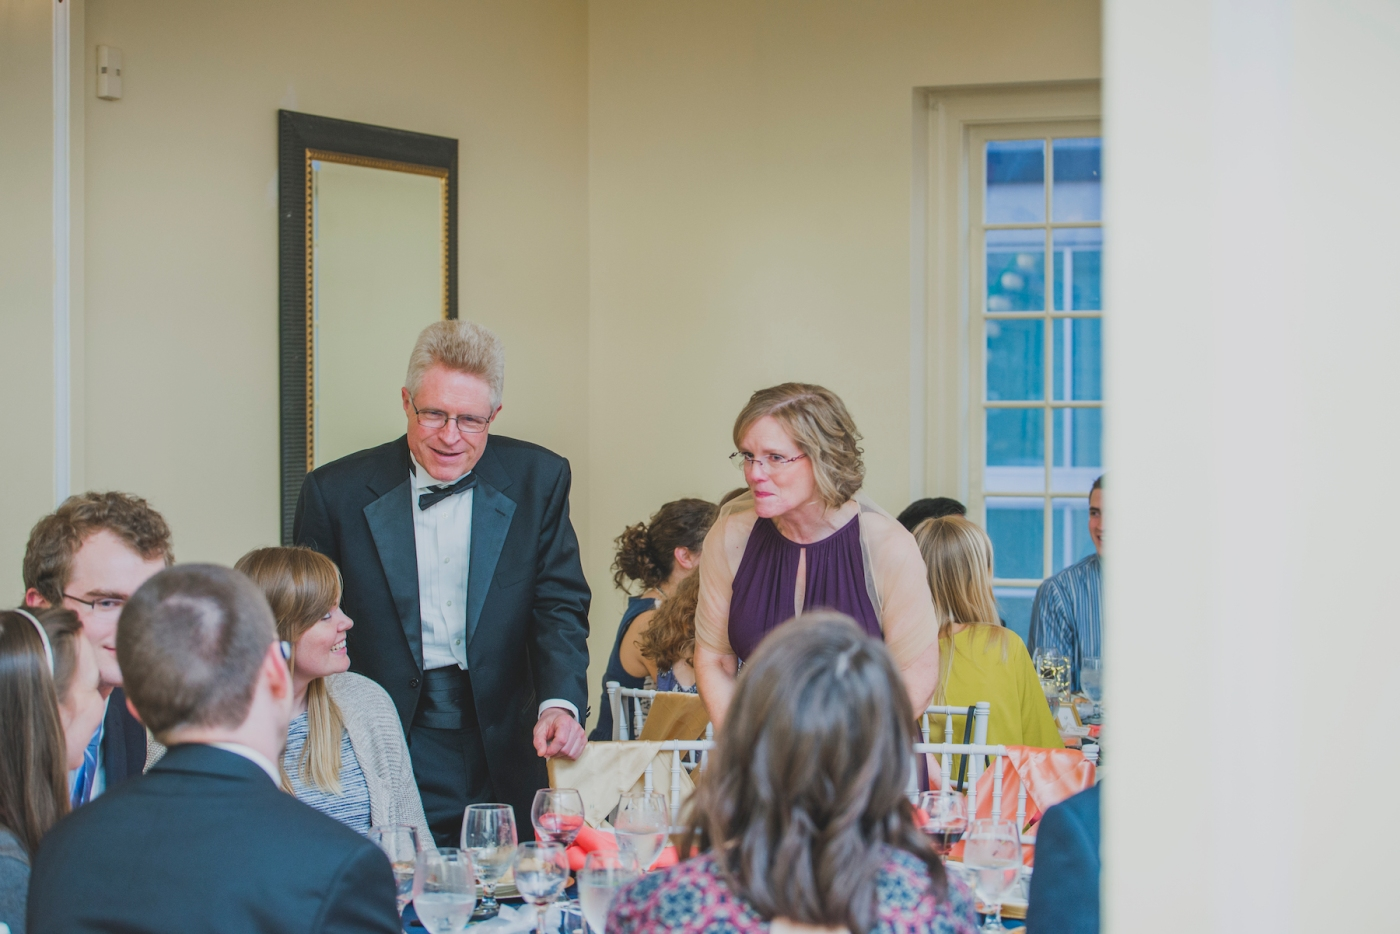 DSC_3193Everett_Wedding_Ballroom_Jane_Speleers_photography_Rachel_and_Edmund_reception_2017